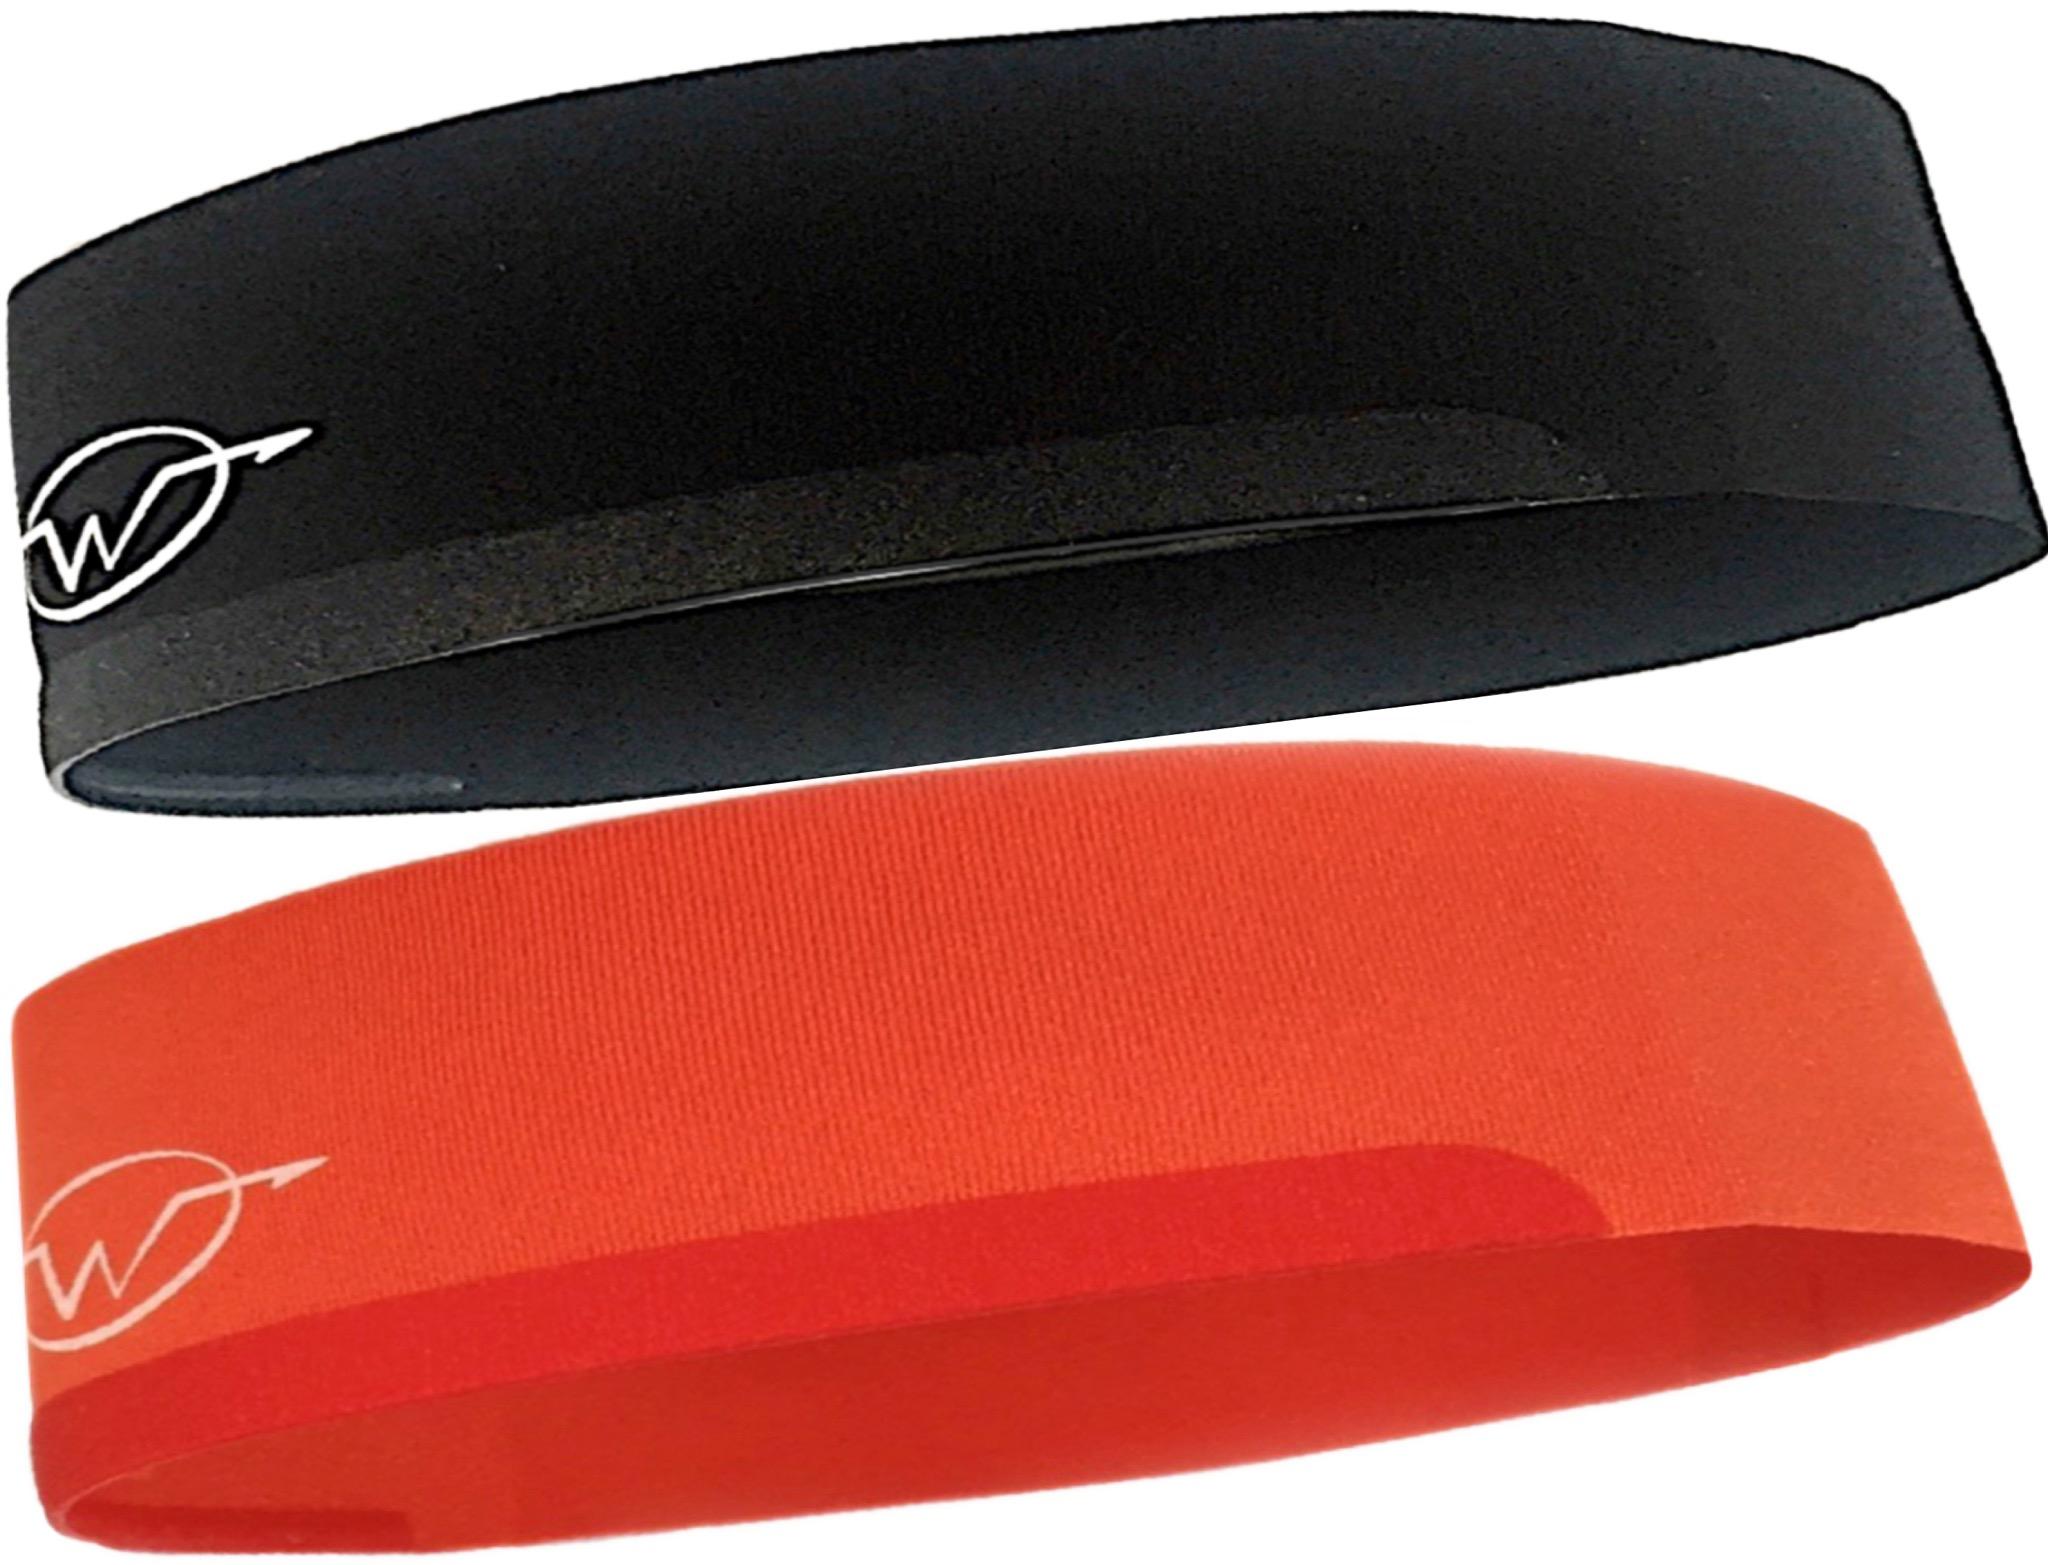 2-Pack Black/ Orange Performance Headbands